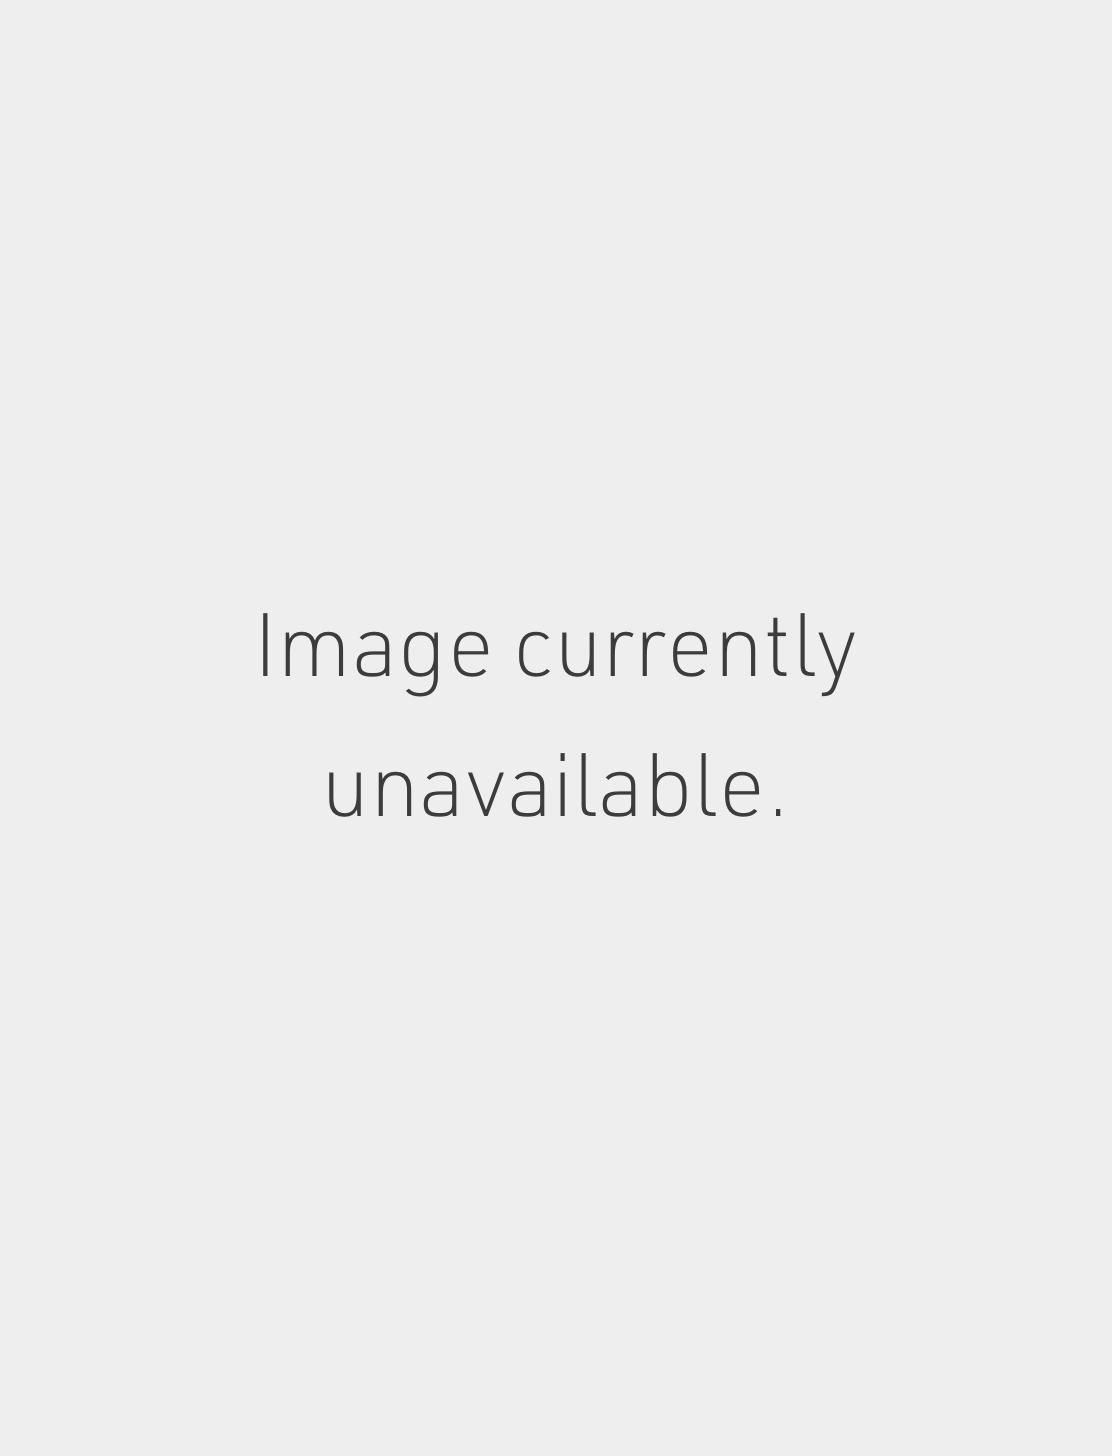 Opal and Diamond MT Tiara  Necklace Image #1